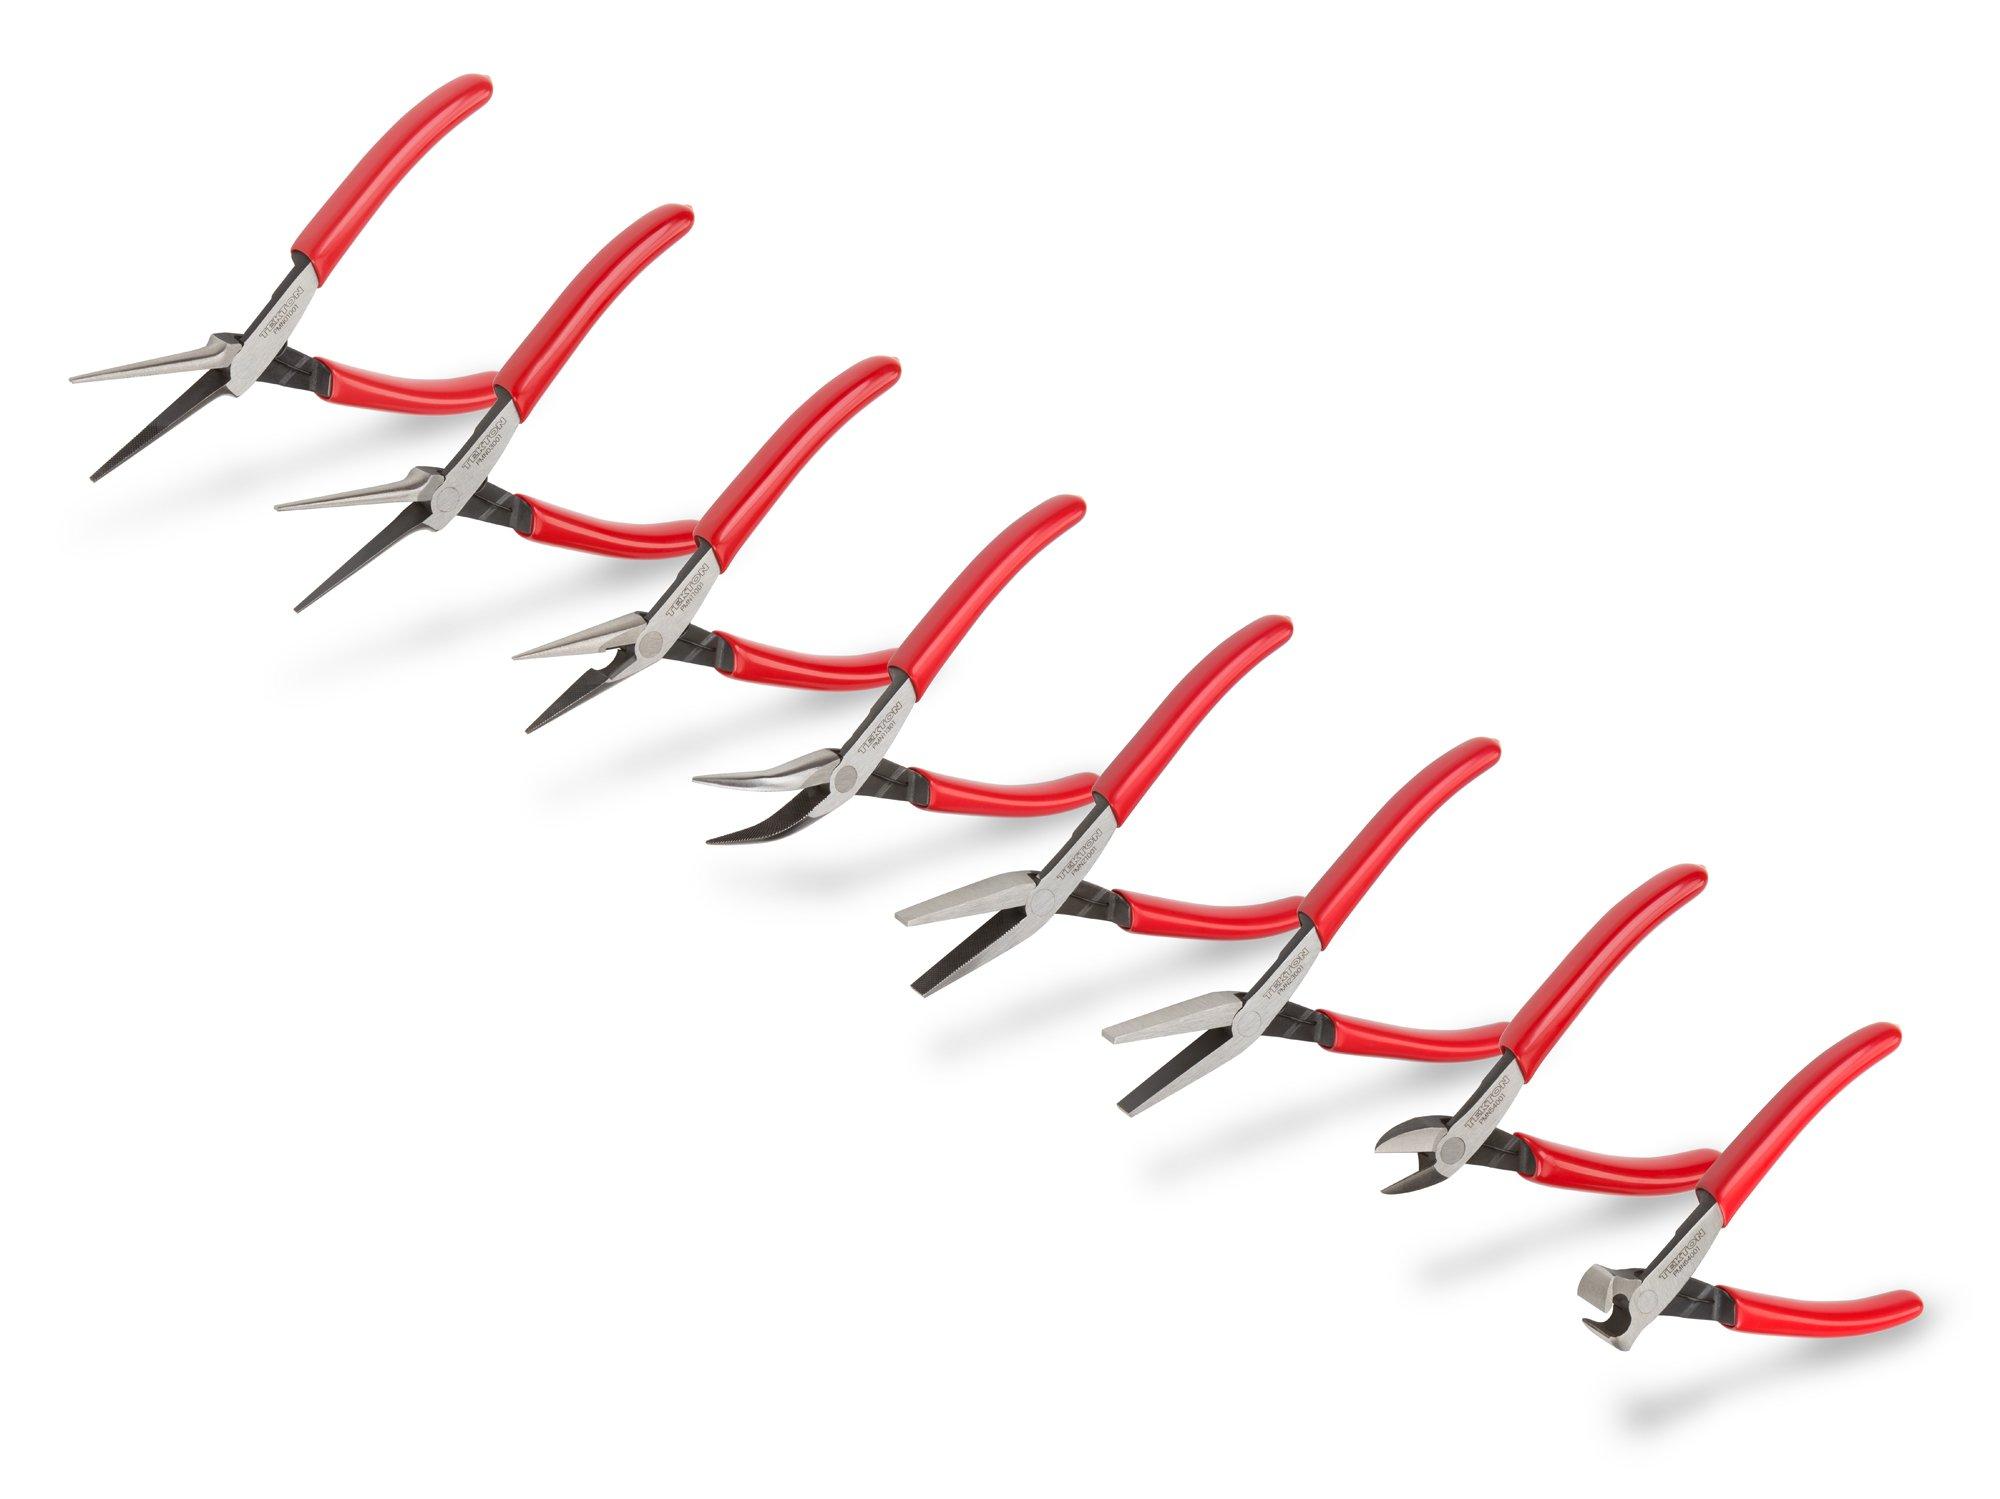 TEKTON Mini Pliers Set, 8-Piece (Needle Nose, Long Nose, Flat Nose, Cutting)   PMN99908